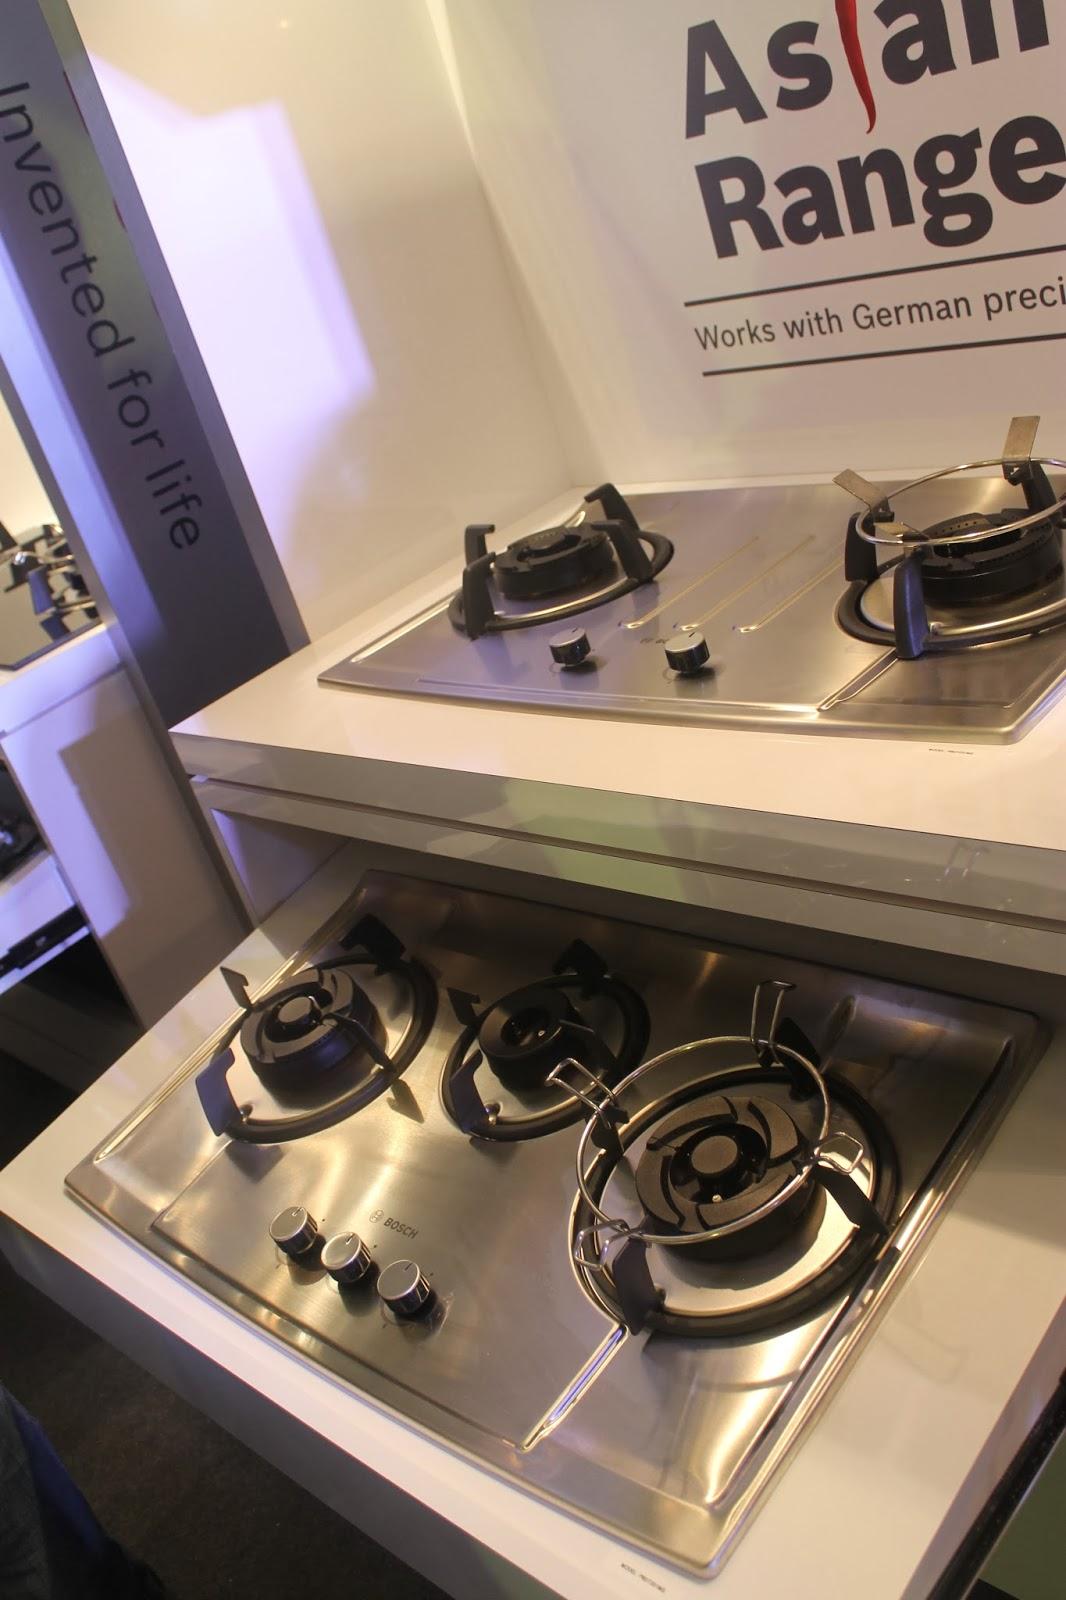 Bila Rumah Bera Bersama Perkakasan Bosch Unboxing Philips Induction Cooker Hd4902 Dapur Elektrik